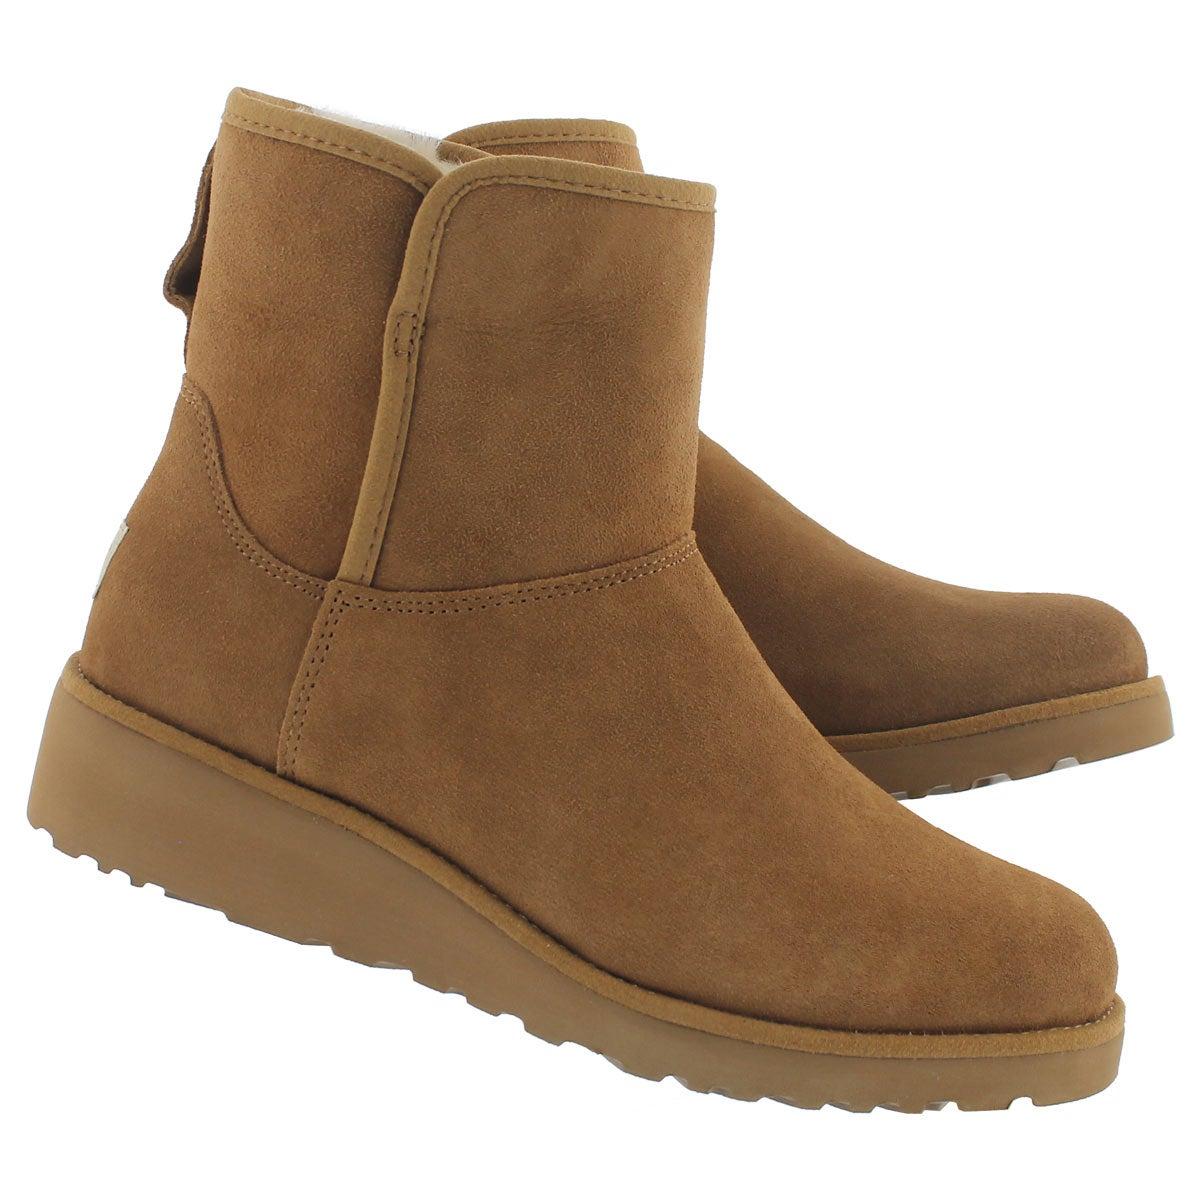 Lds Kristin ches wedge sheepskin boot